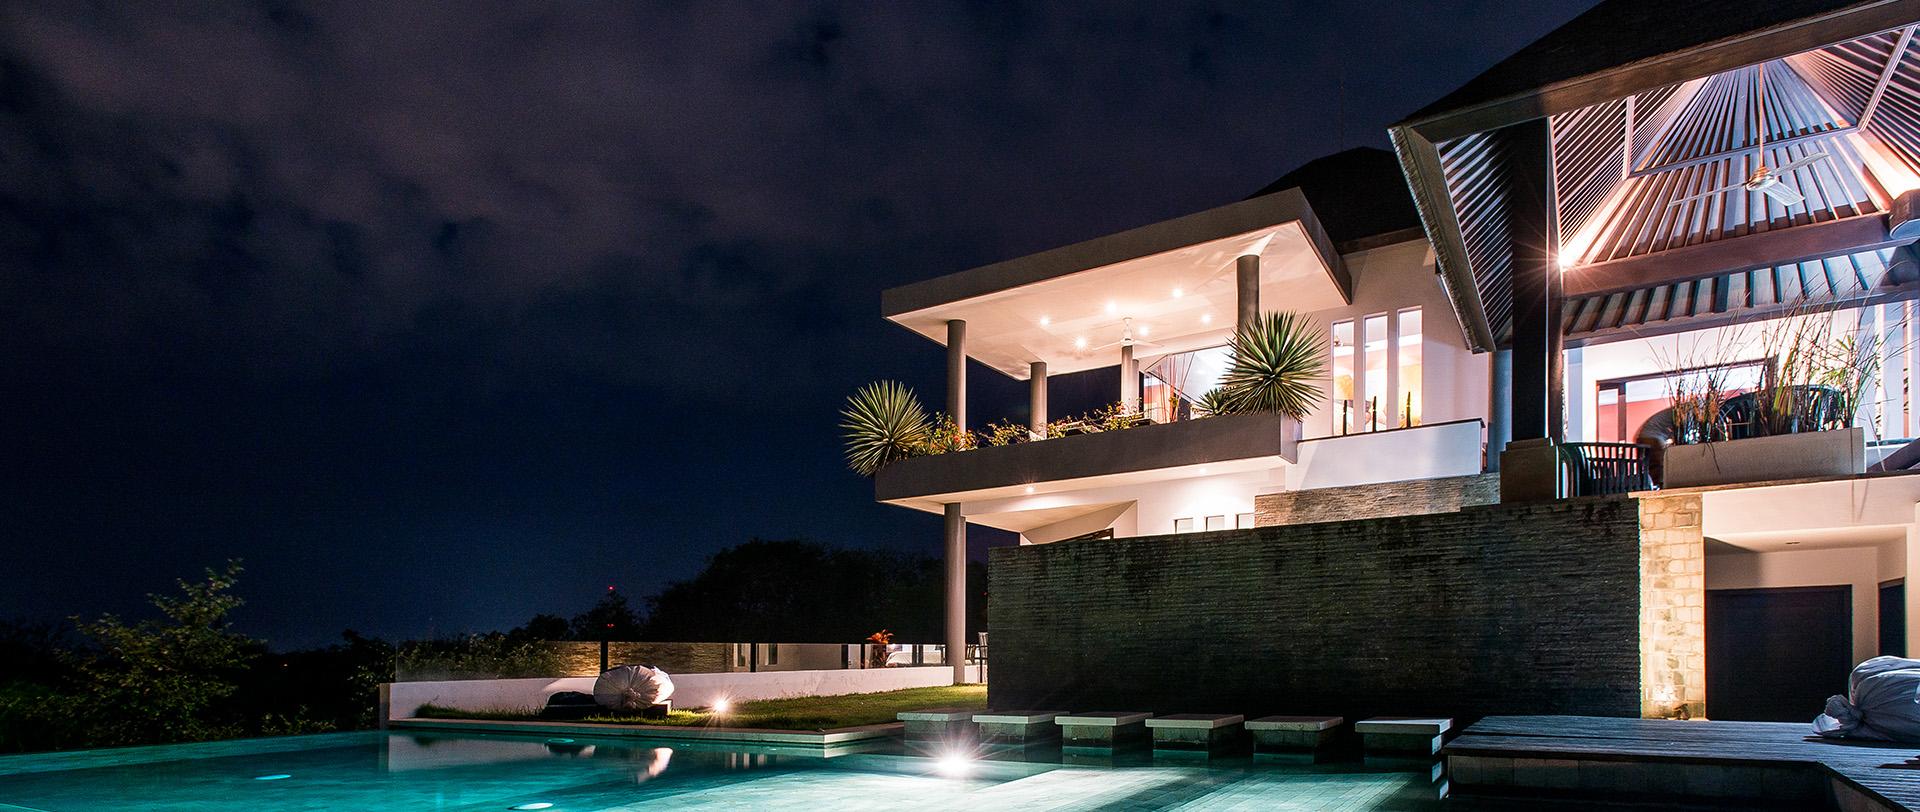 Villas in Bukit Jimbaran - Contact_20160207045950